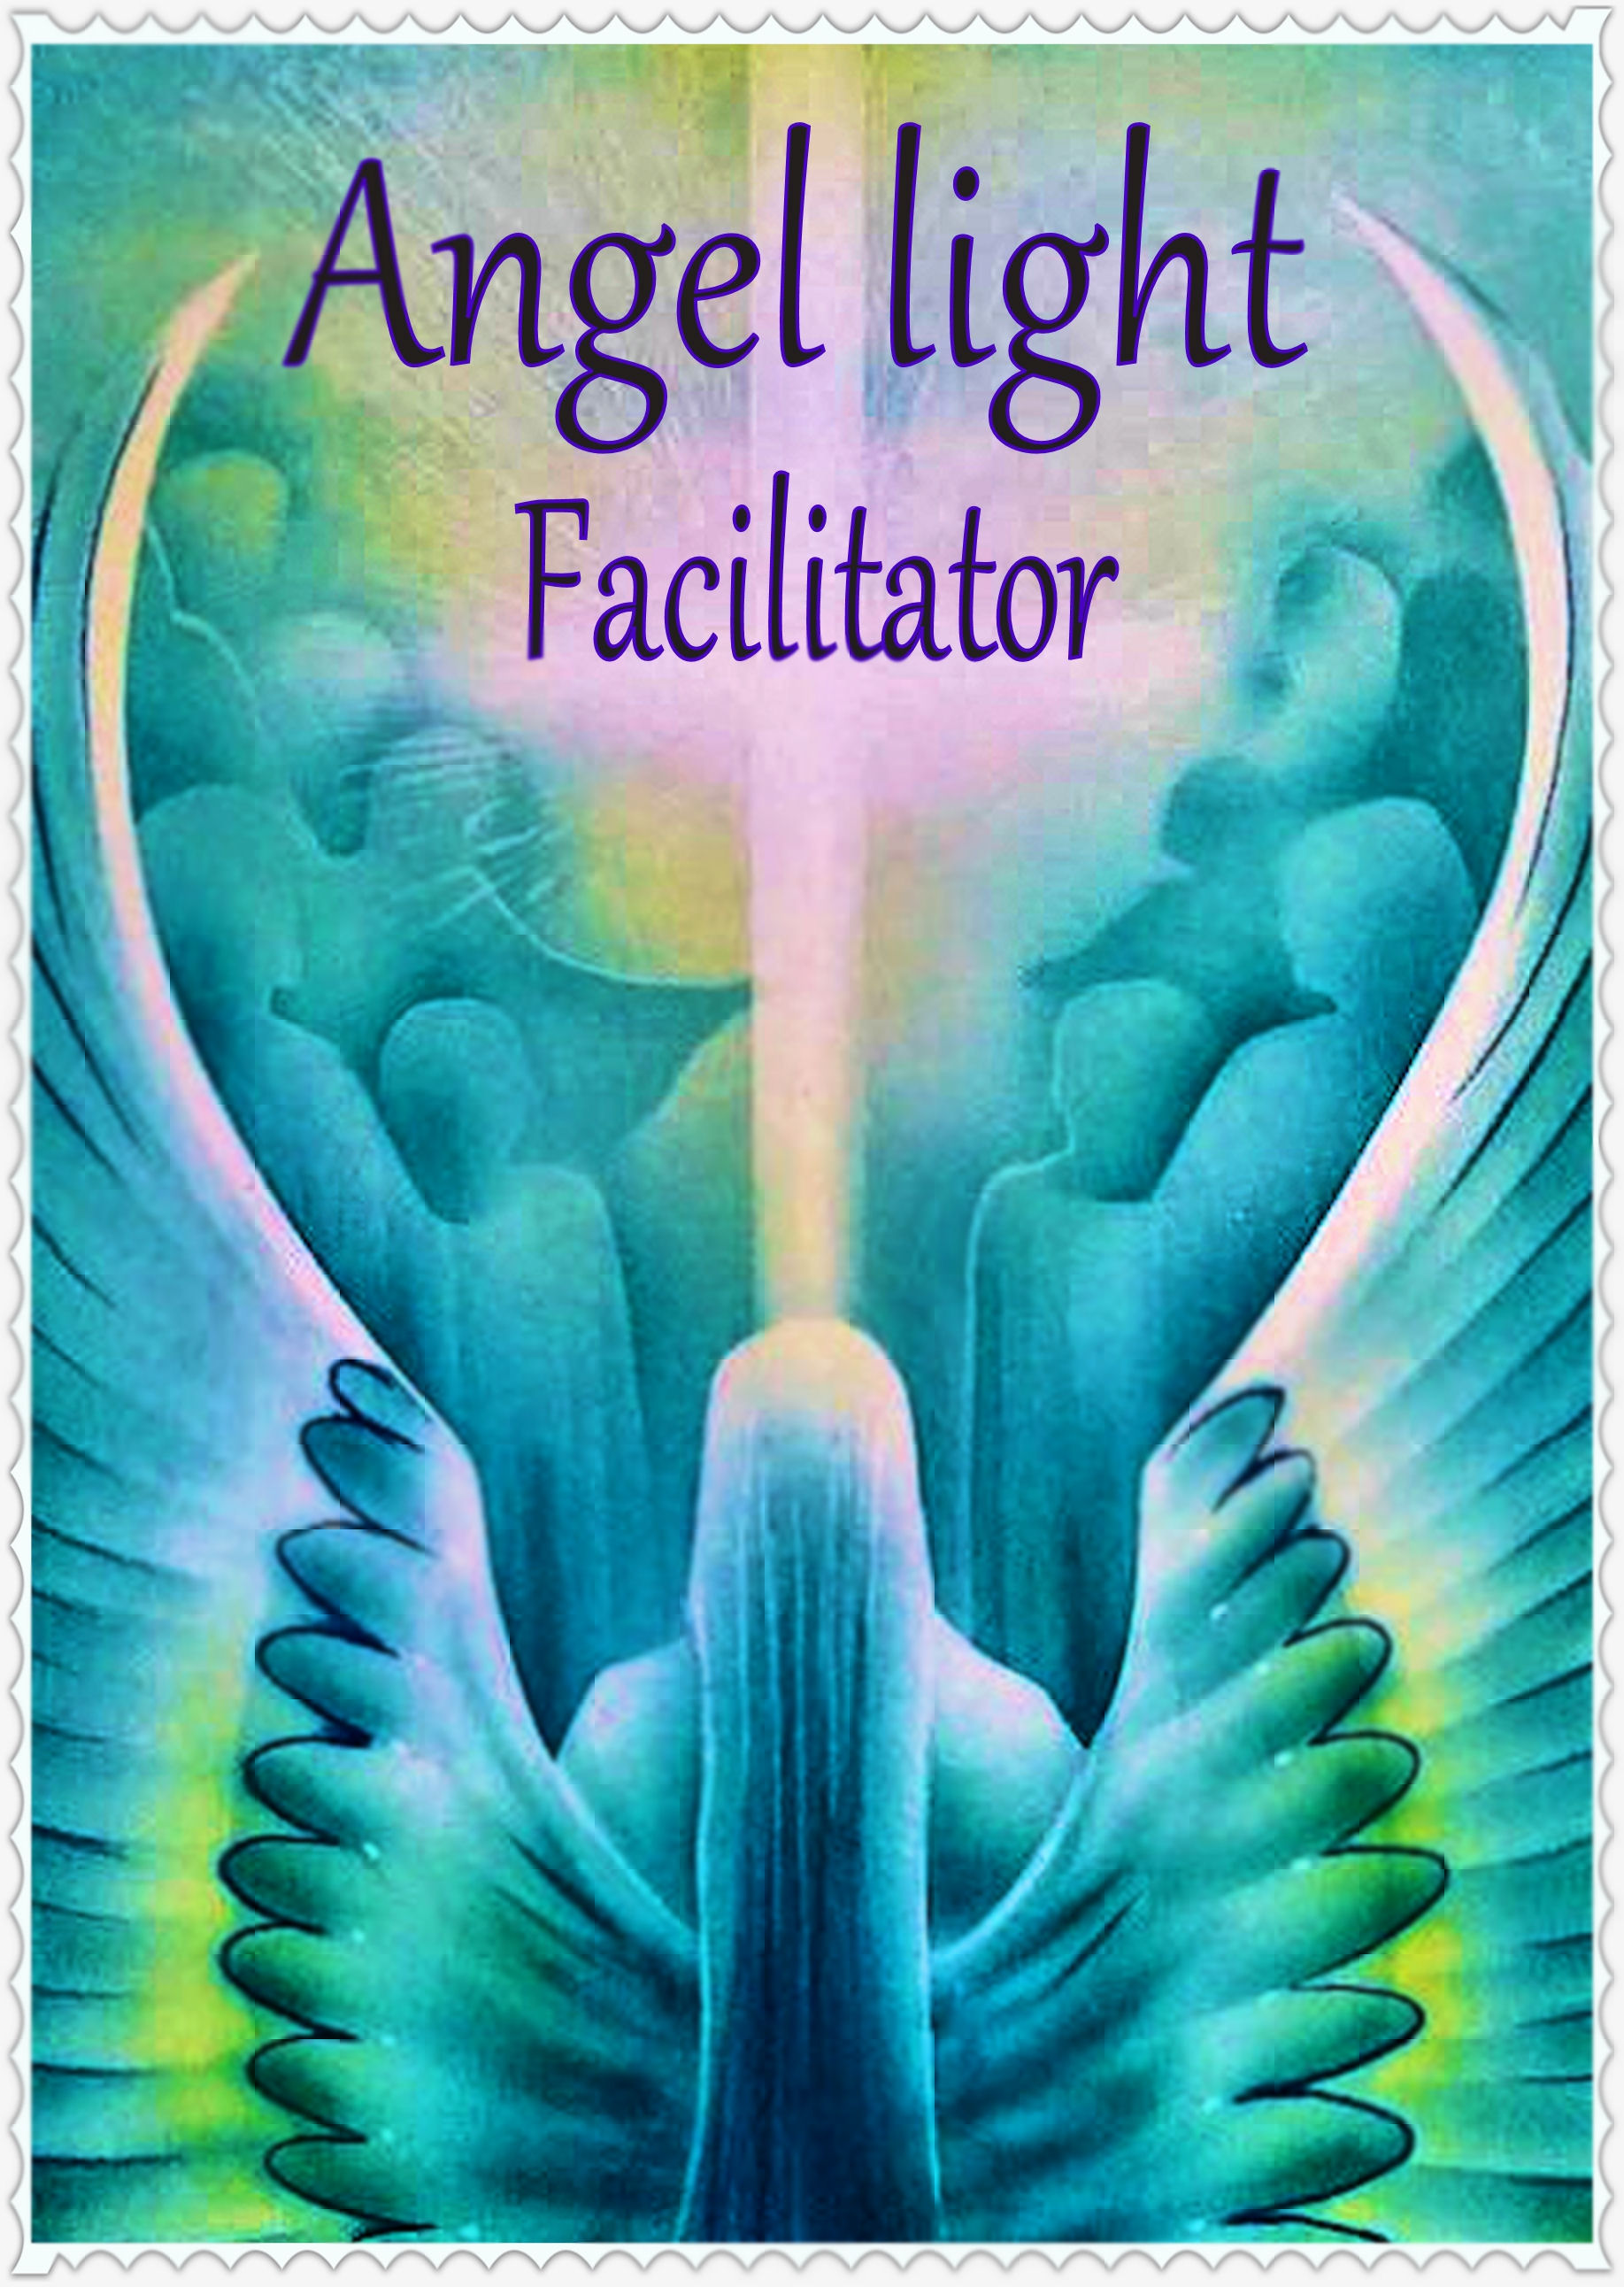 Angel Light facilitator - Divine Life, Light & Love